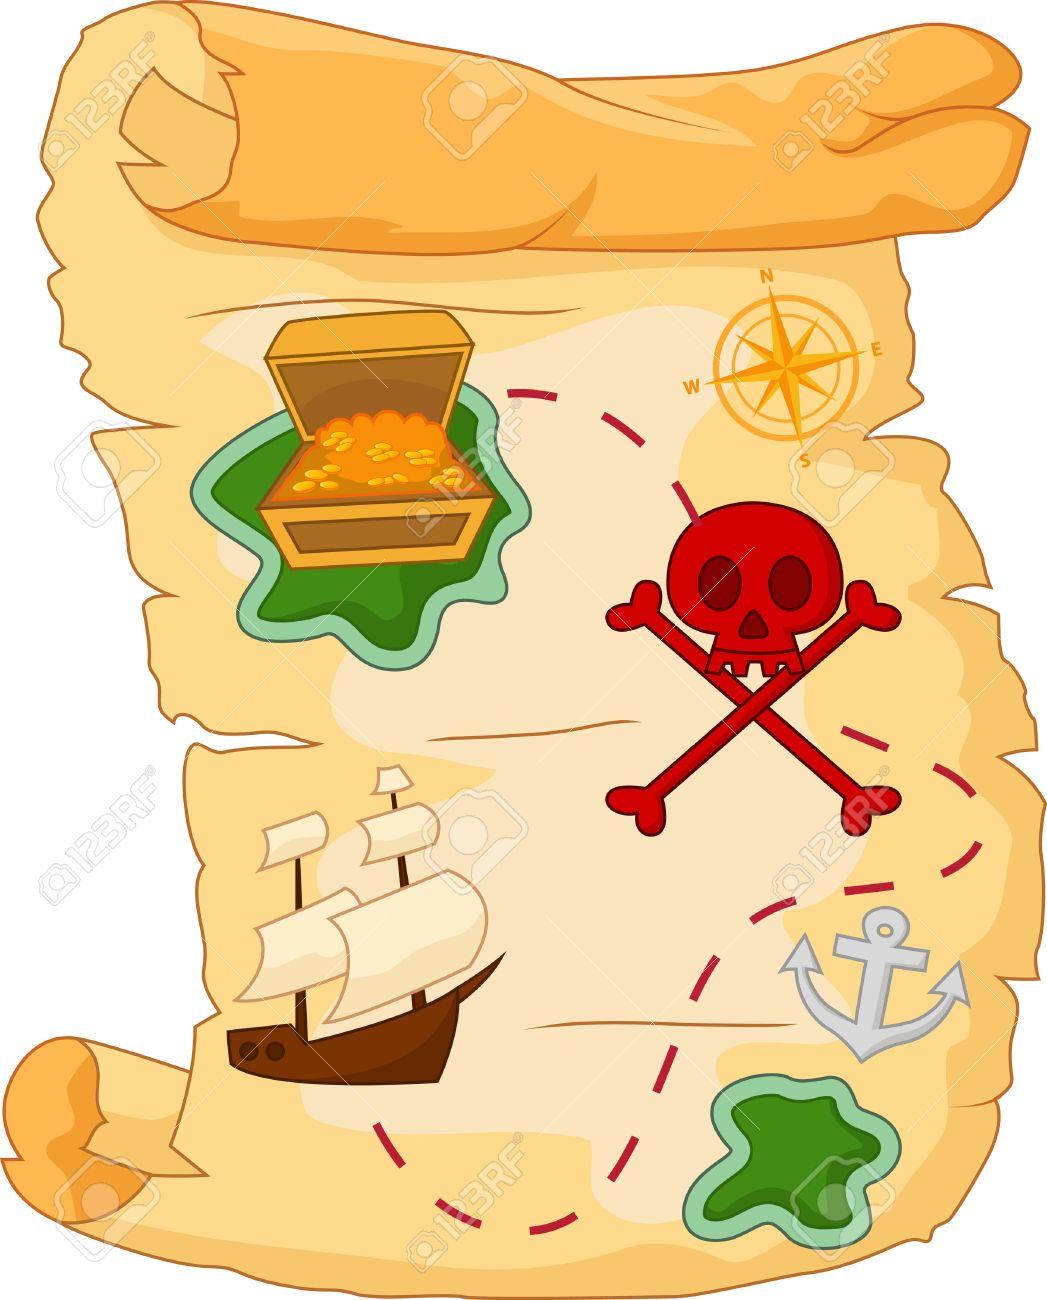 Treasure Map Cartoon Royalty Free Cliparts, Vectors, And Stock ... on